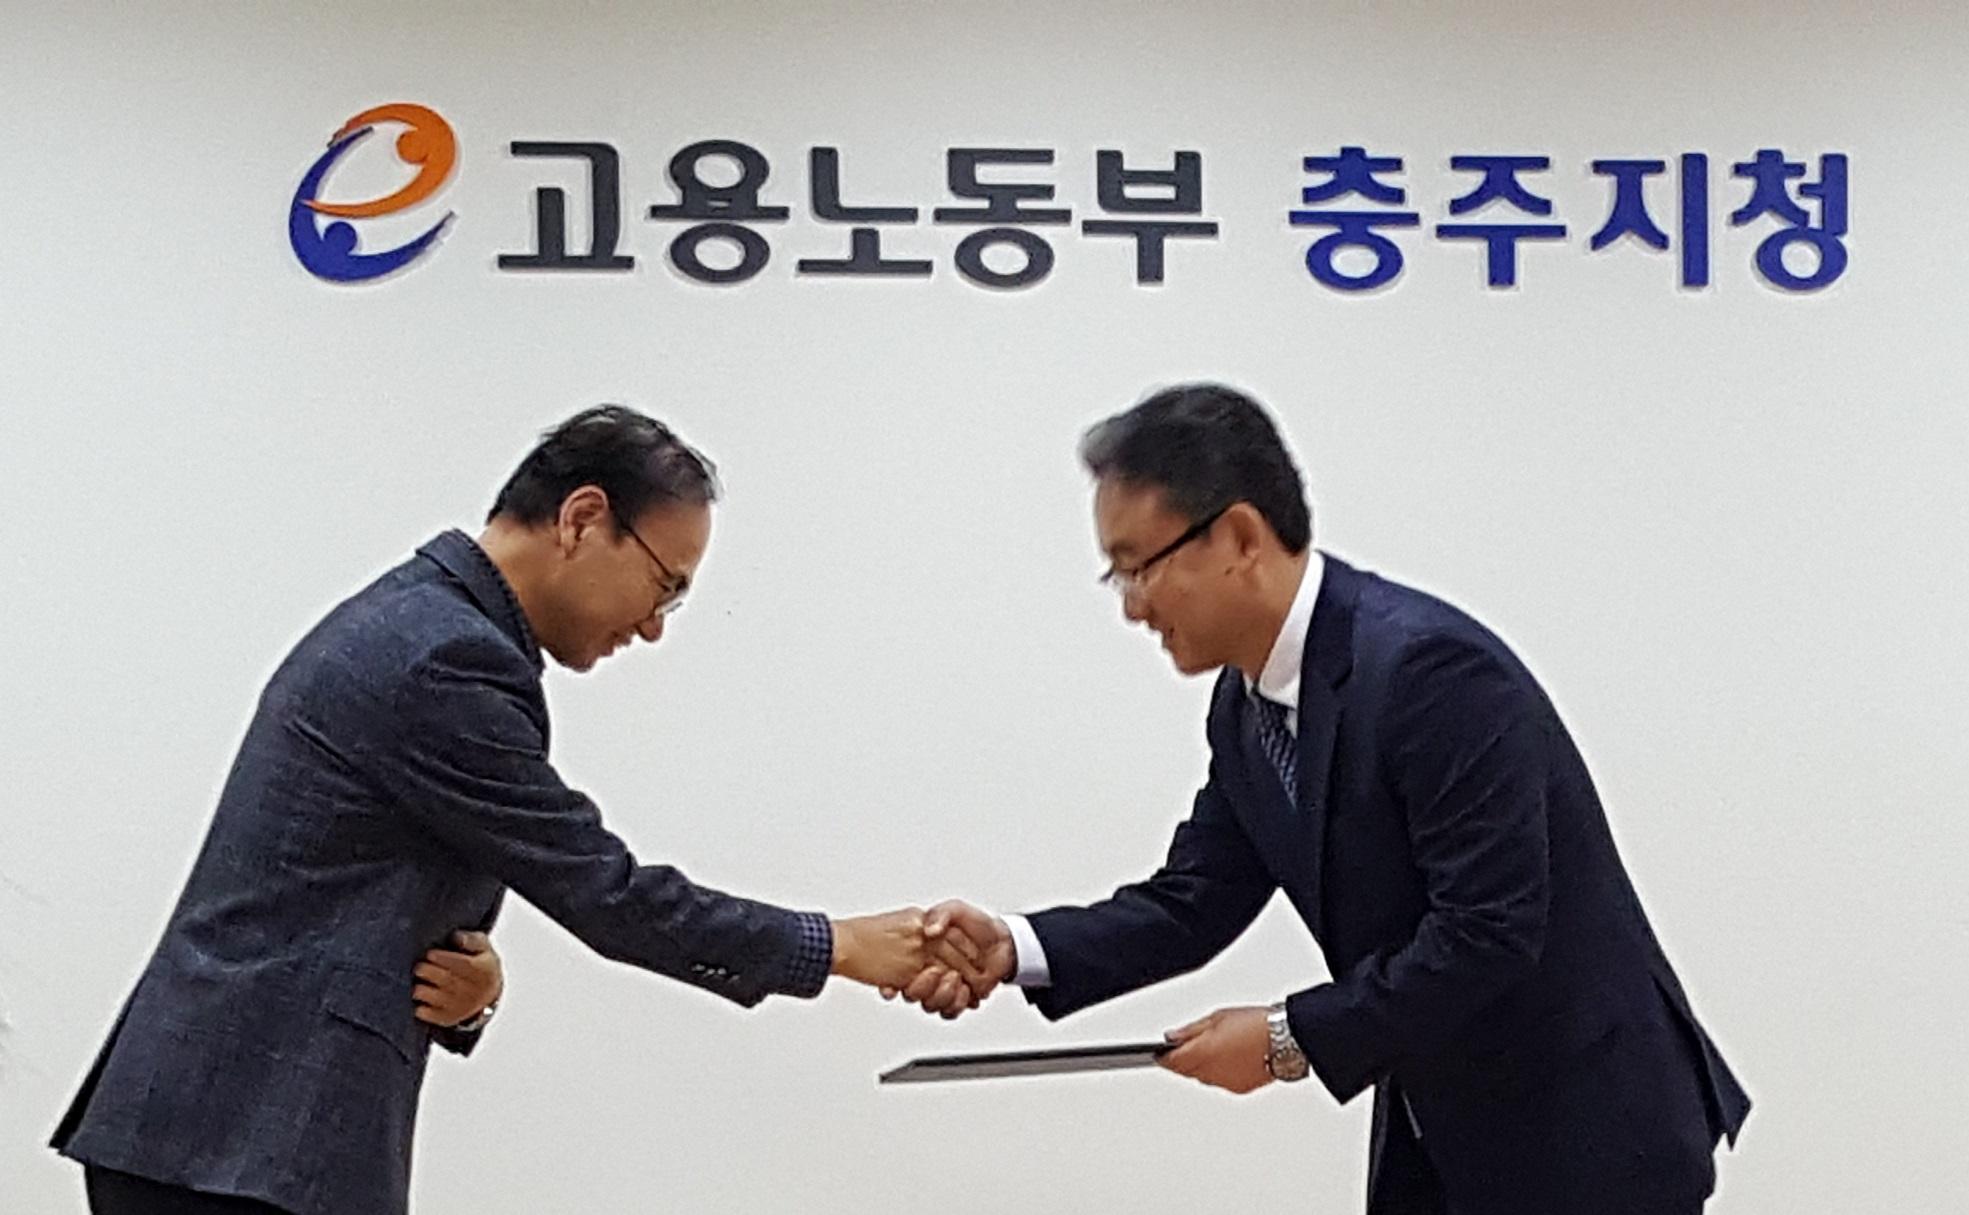 South Korea Minister of Employment Award